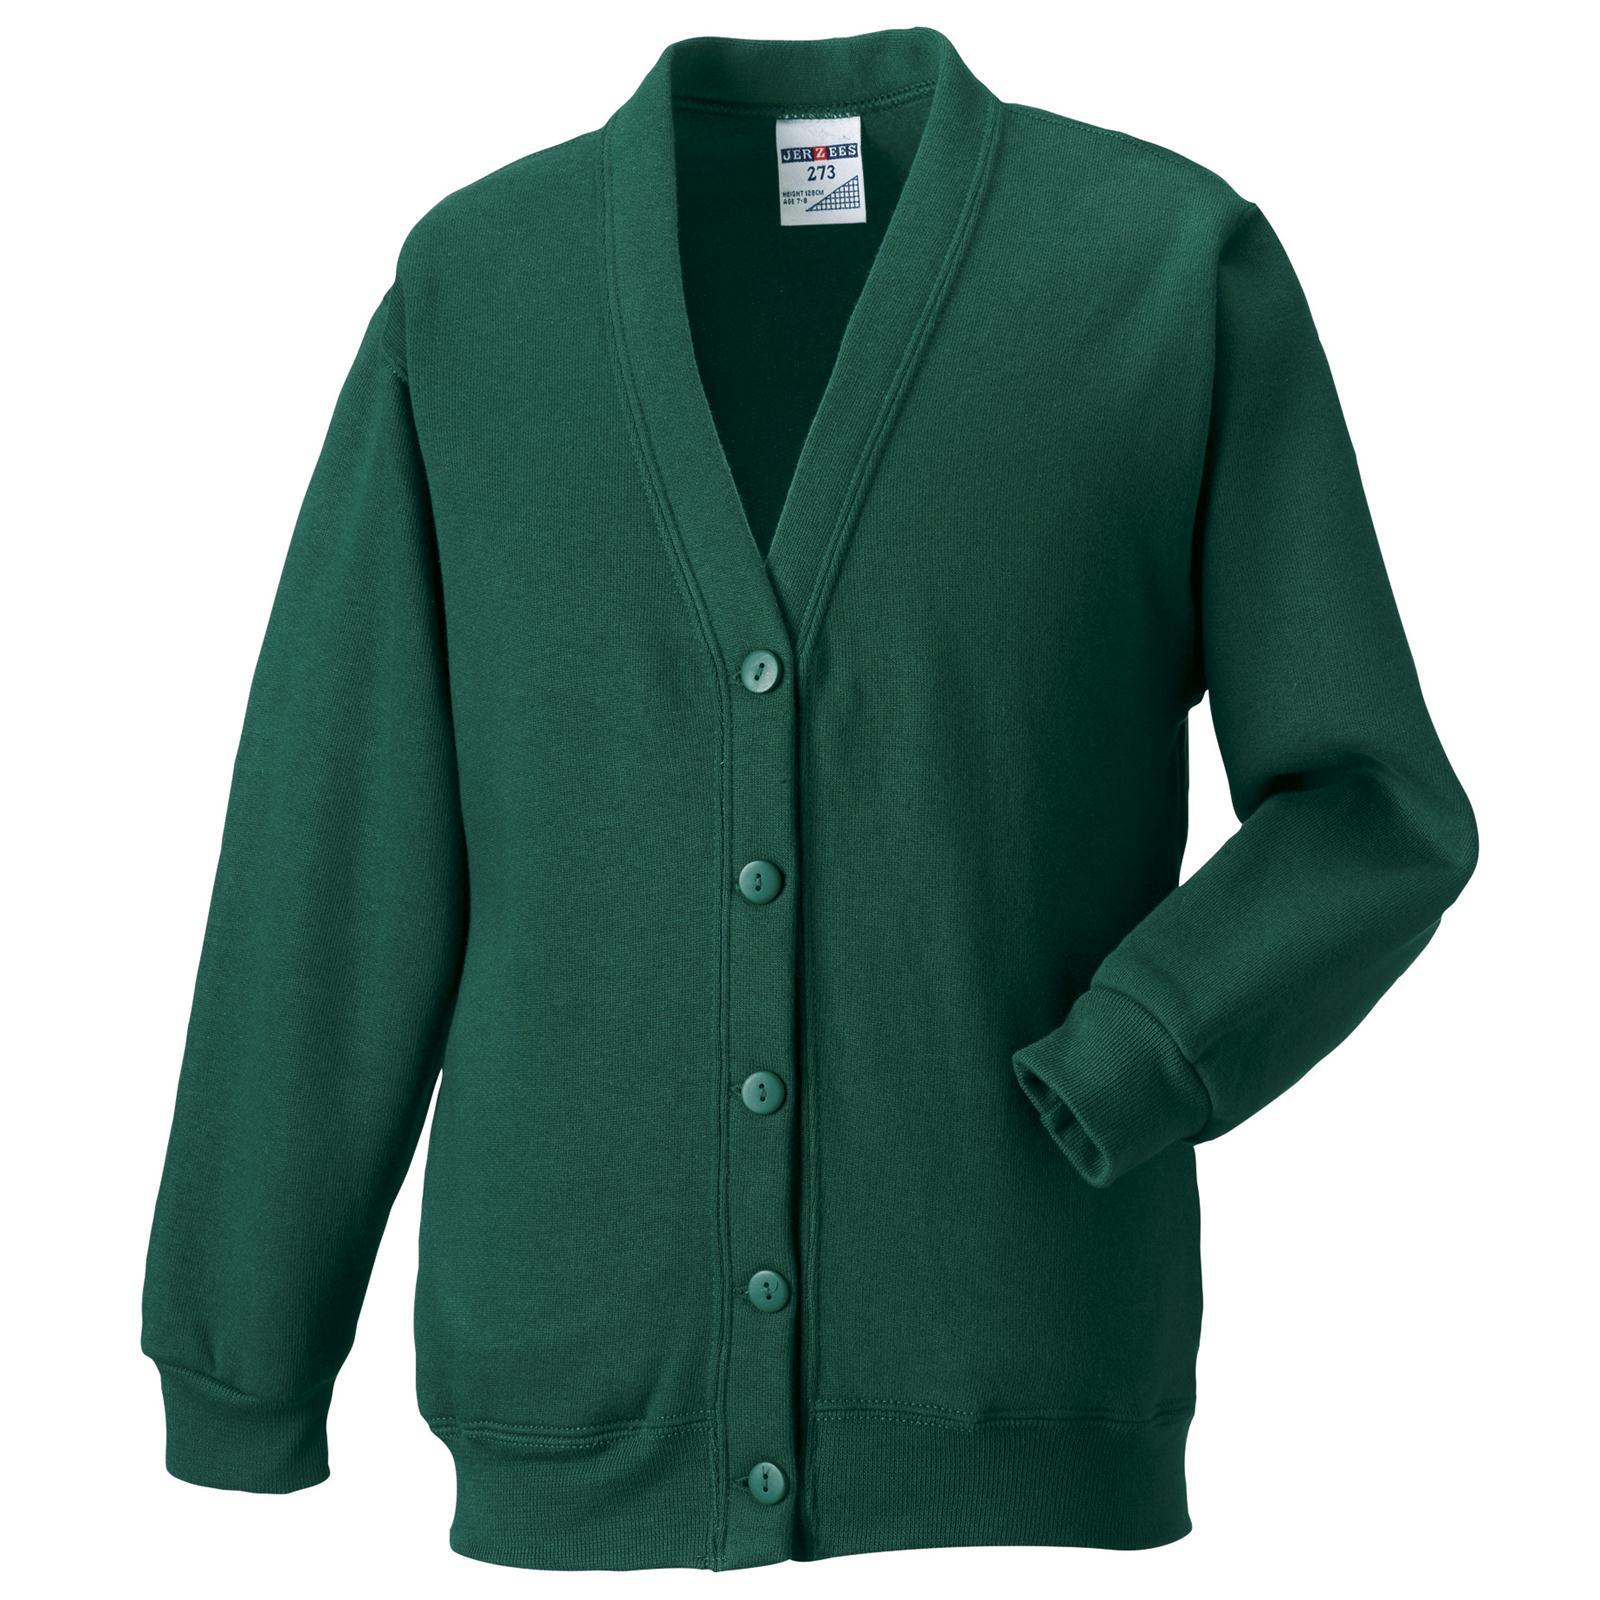 Xl mens clothing online